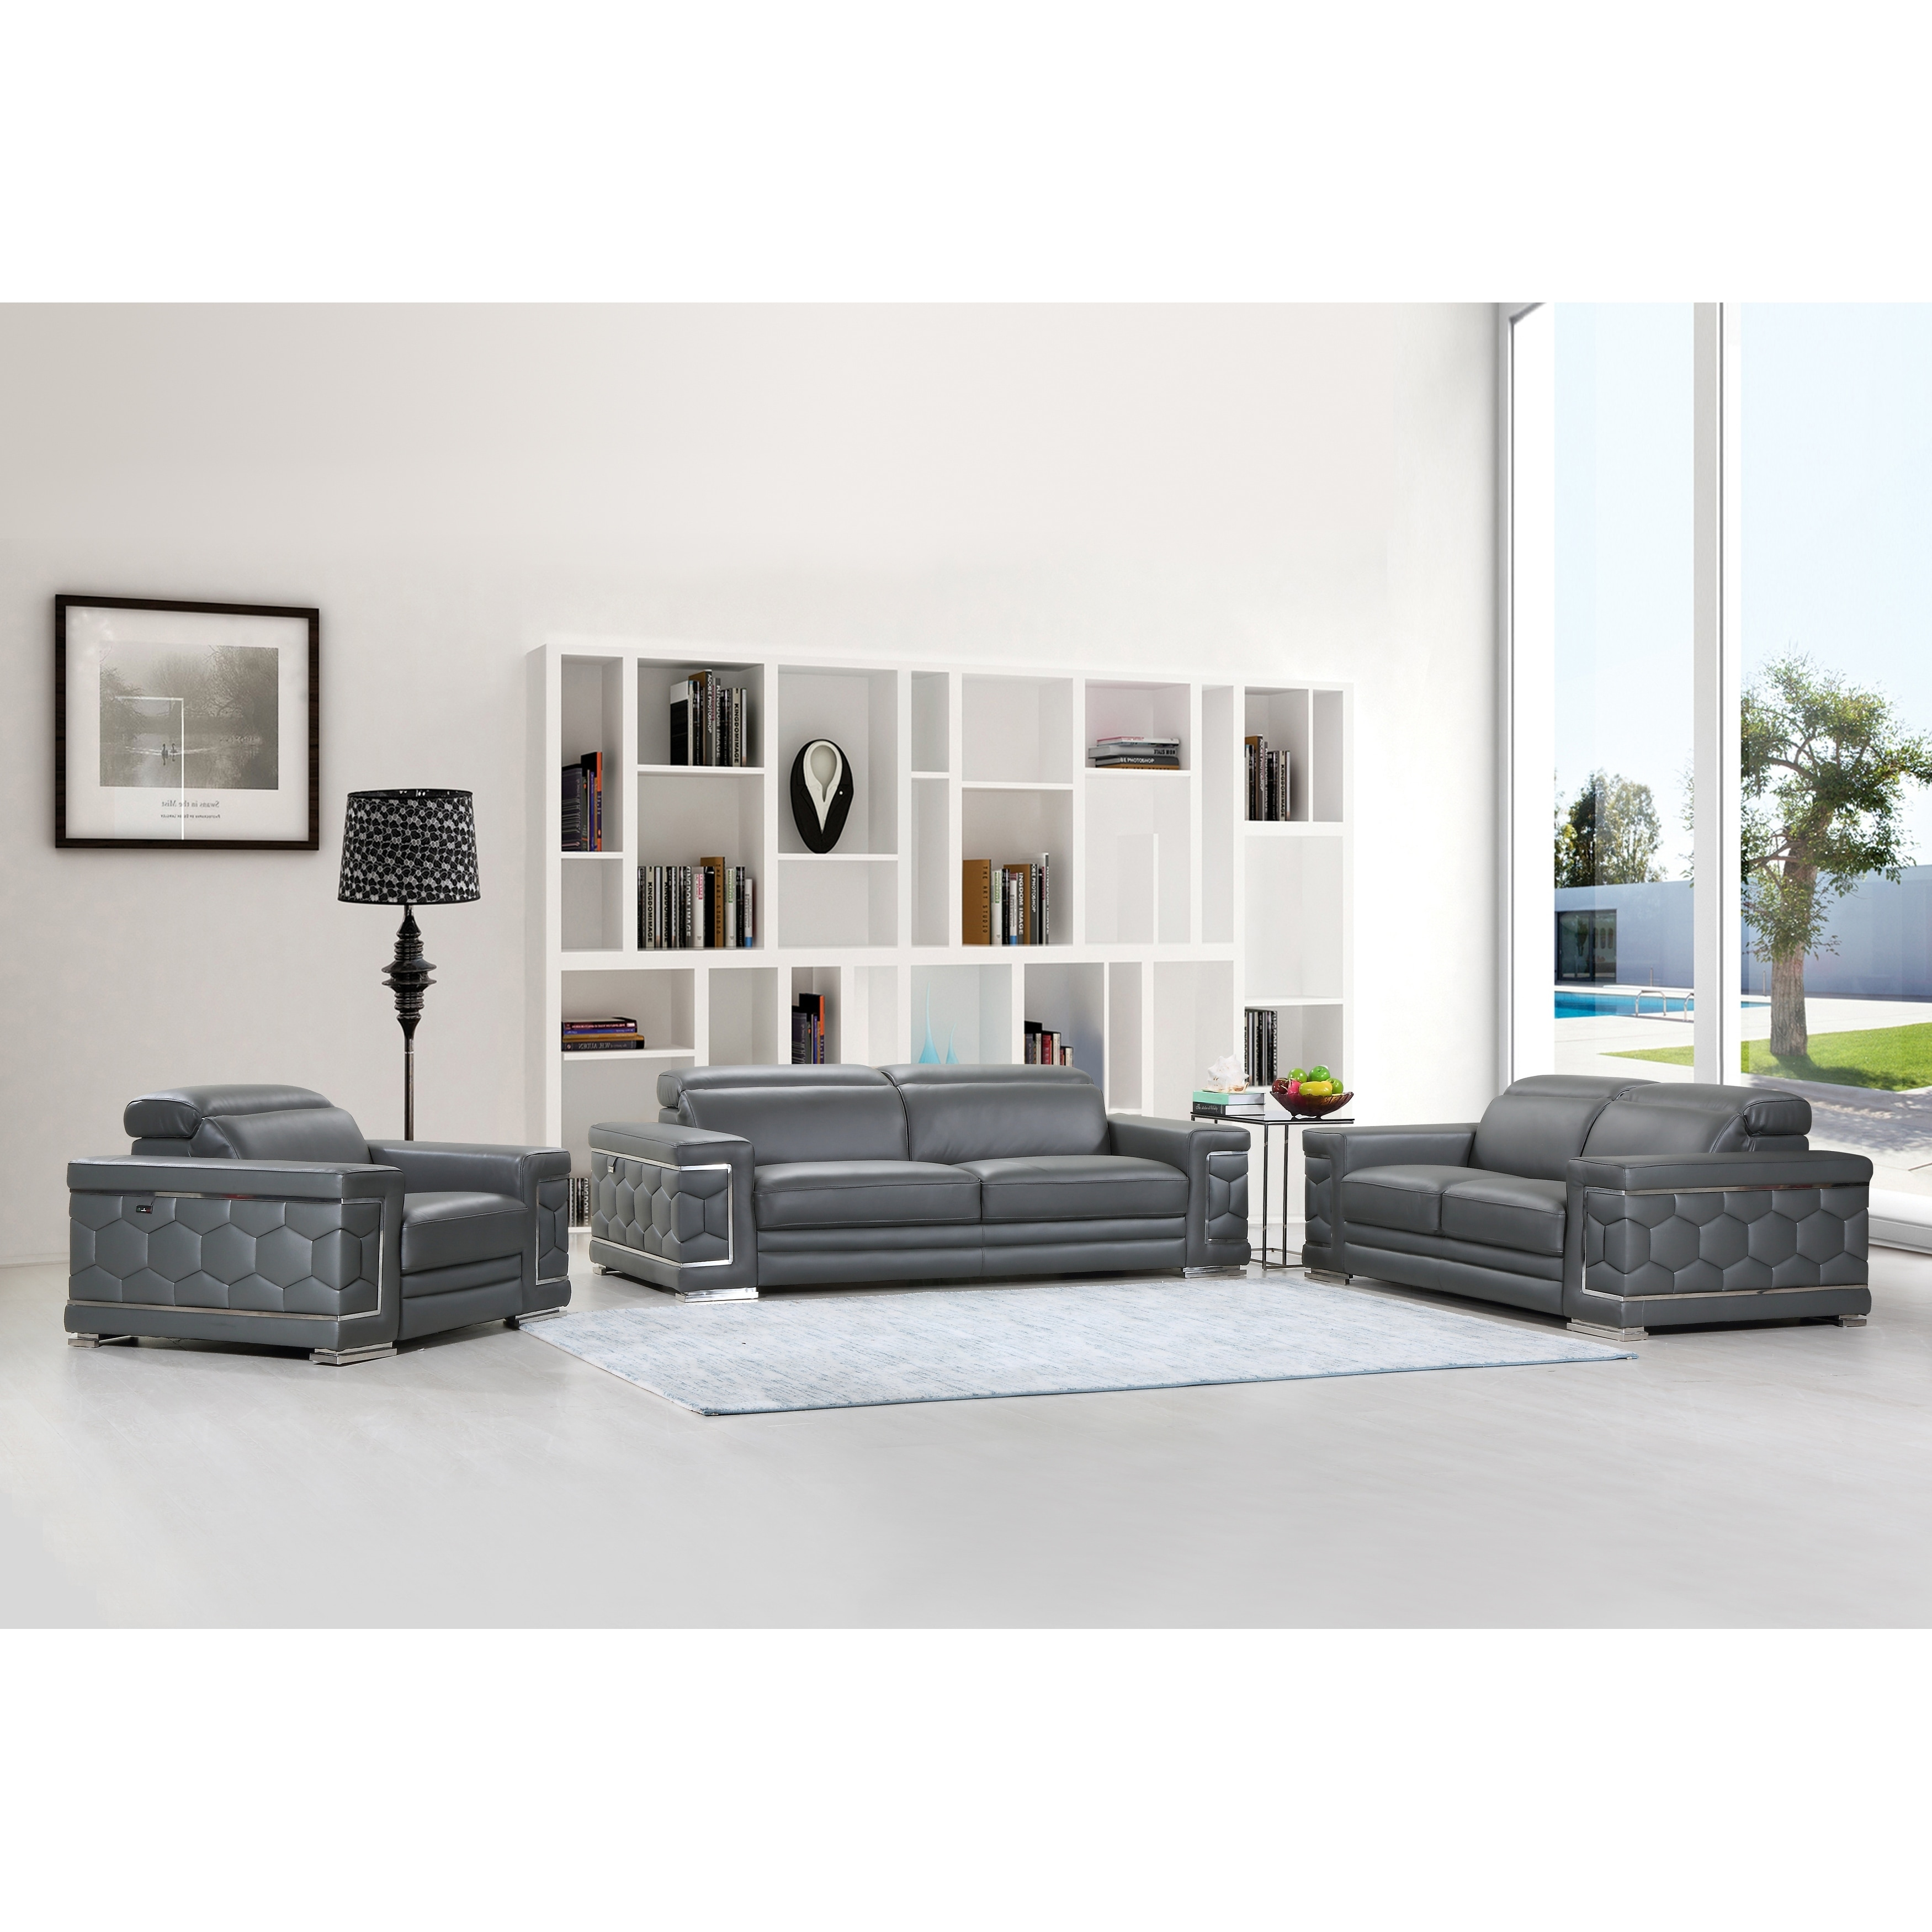 Shop DivanItalia Ferrara Luxury Italian Leather Upholstered Complete ...